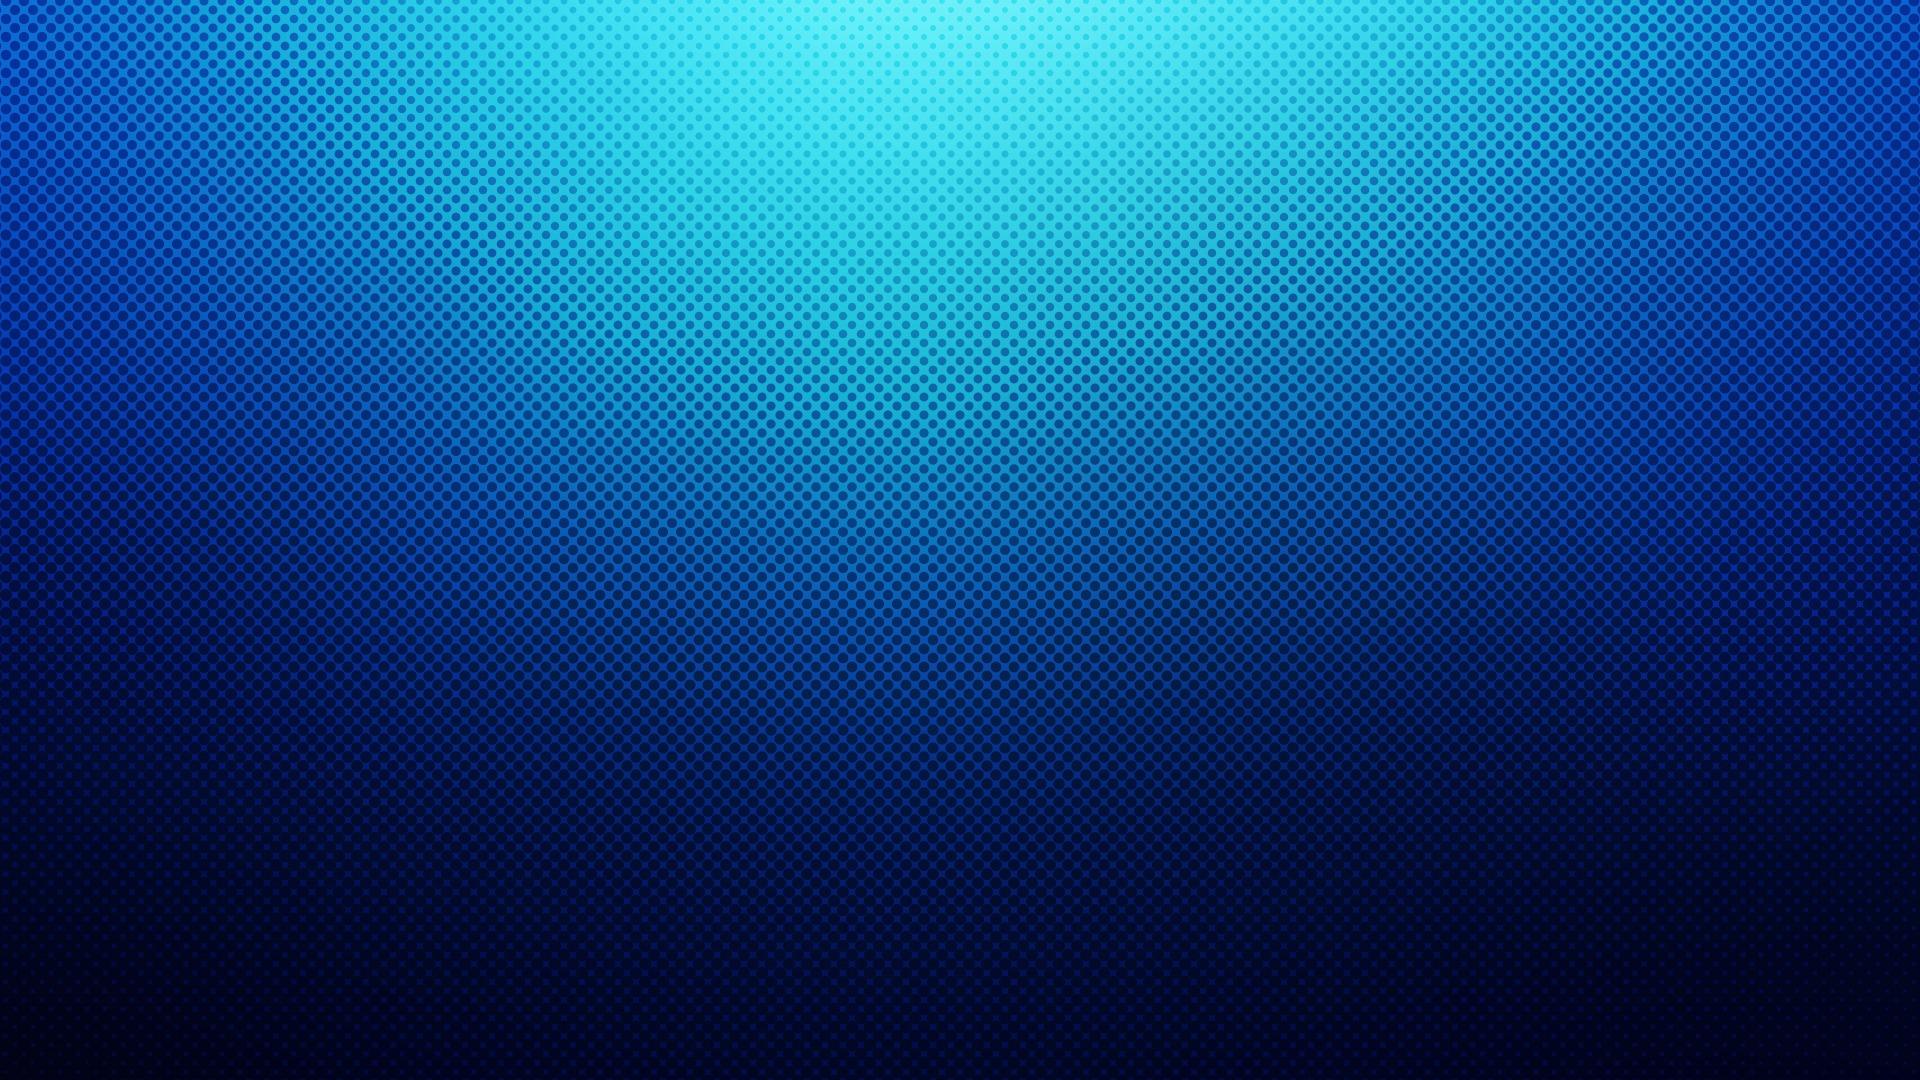 wp contentuploads201405Blue Gradient Background HD Wallpaper3jpg 1920x1080